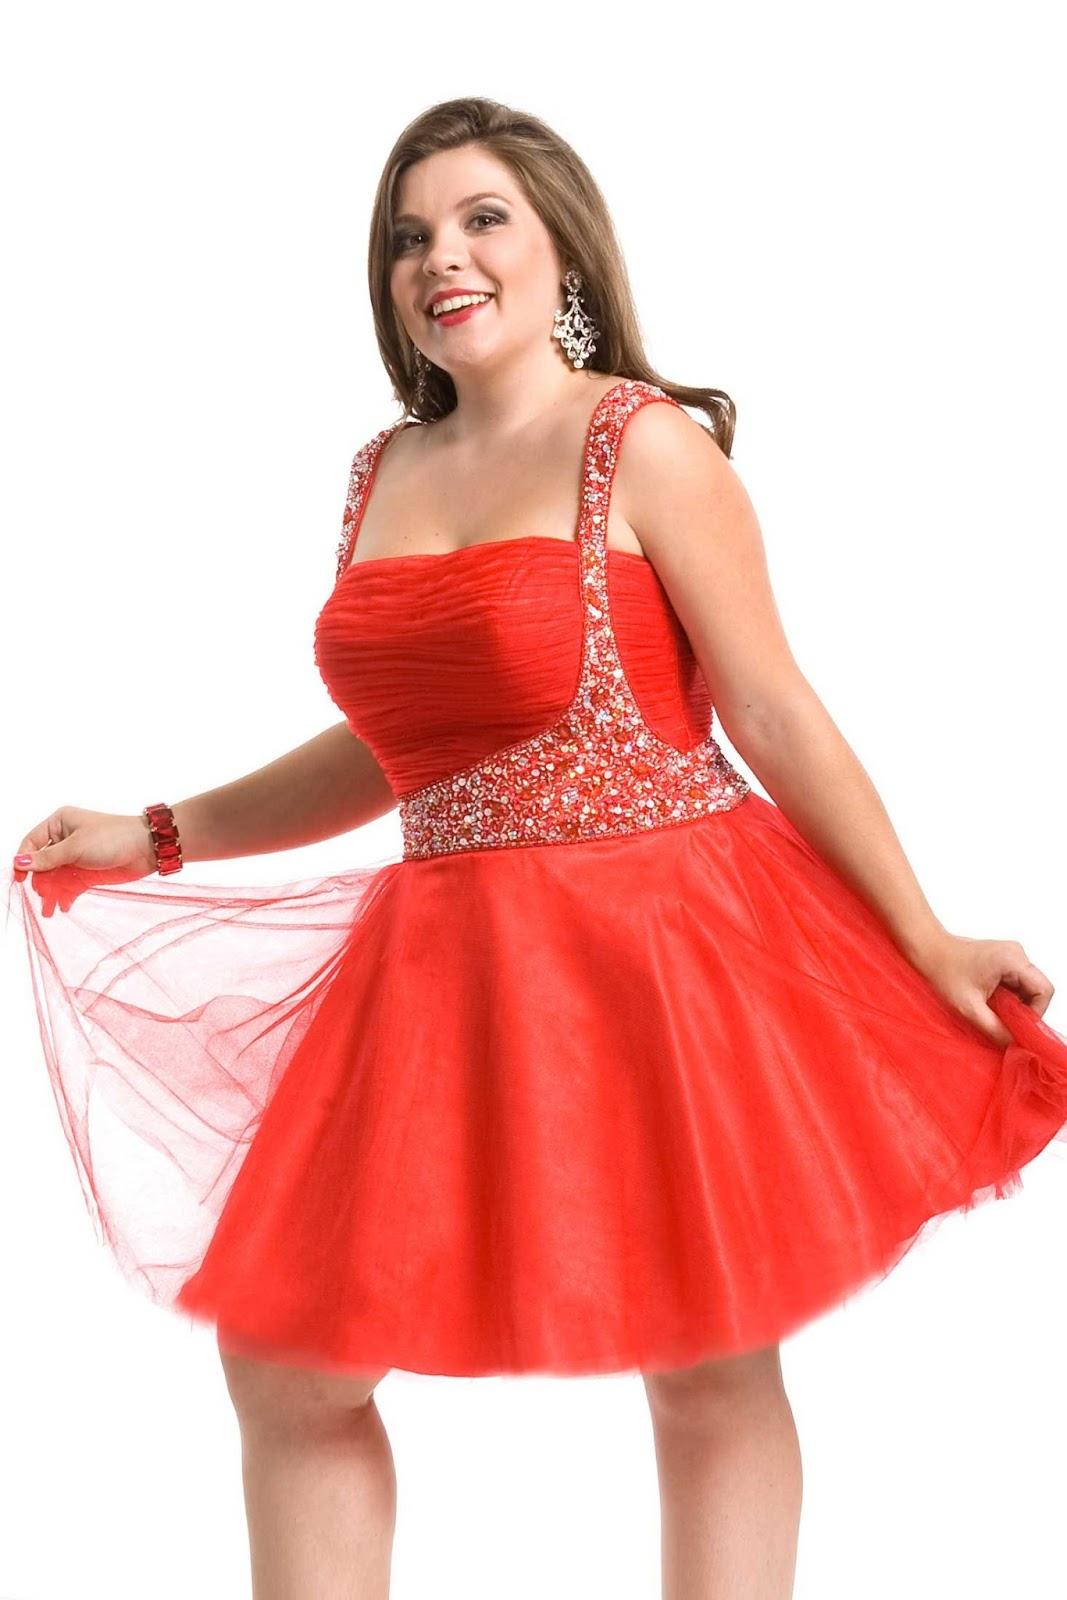 MEDIUM LENGTH HAIRCUT: Red homecoming dresses